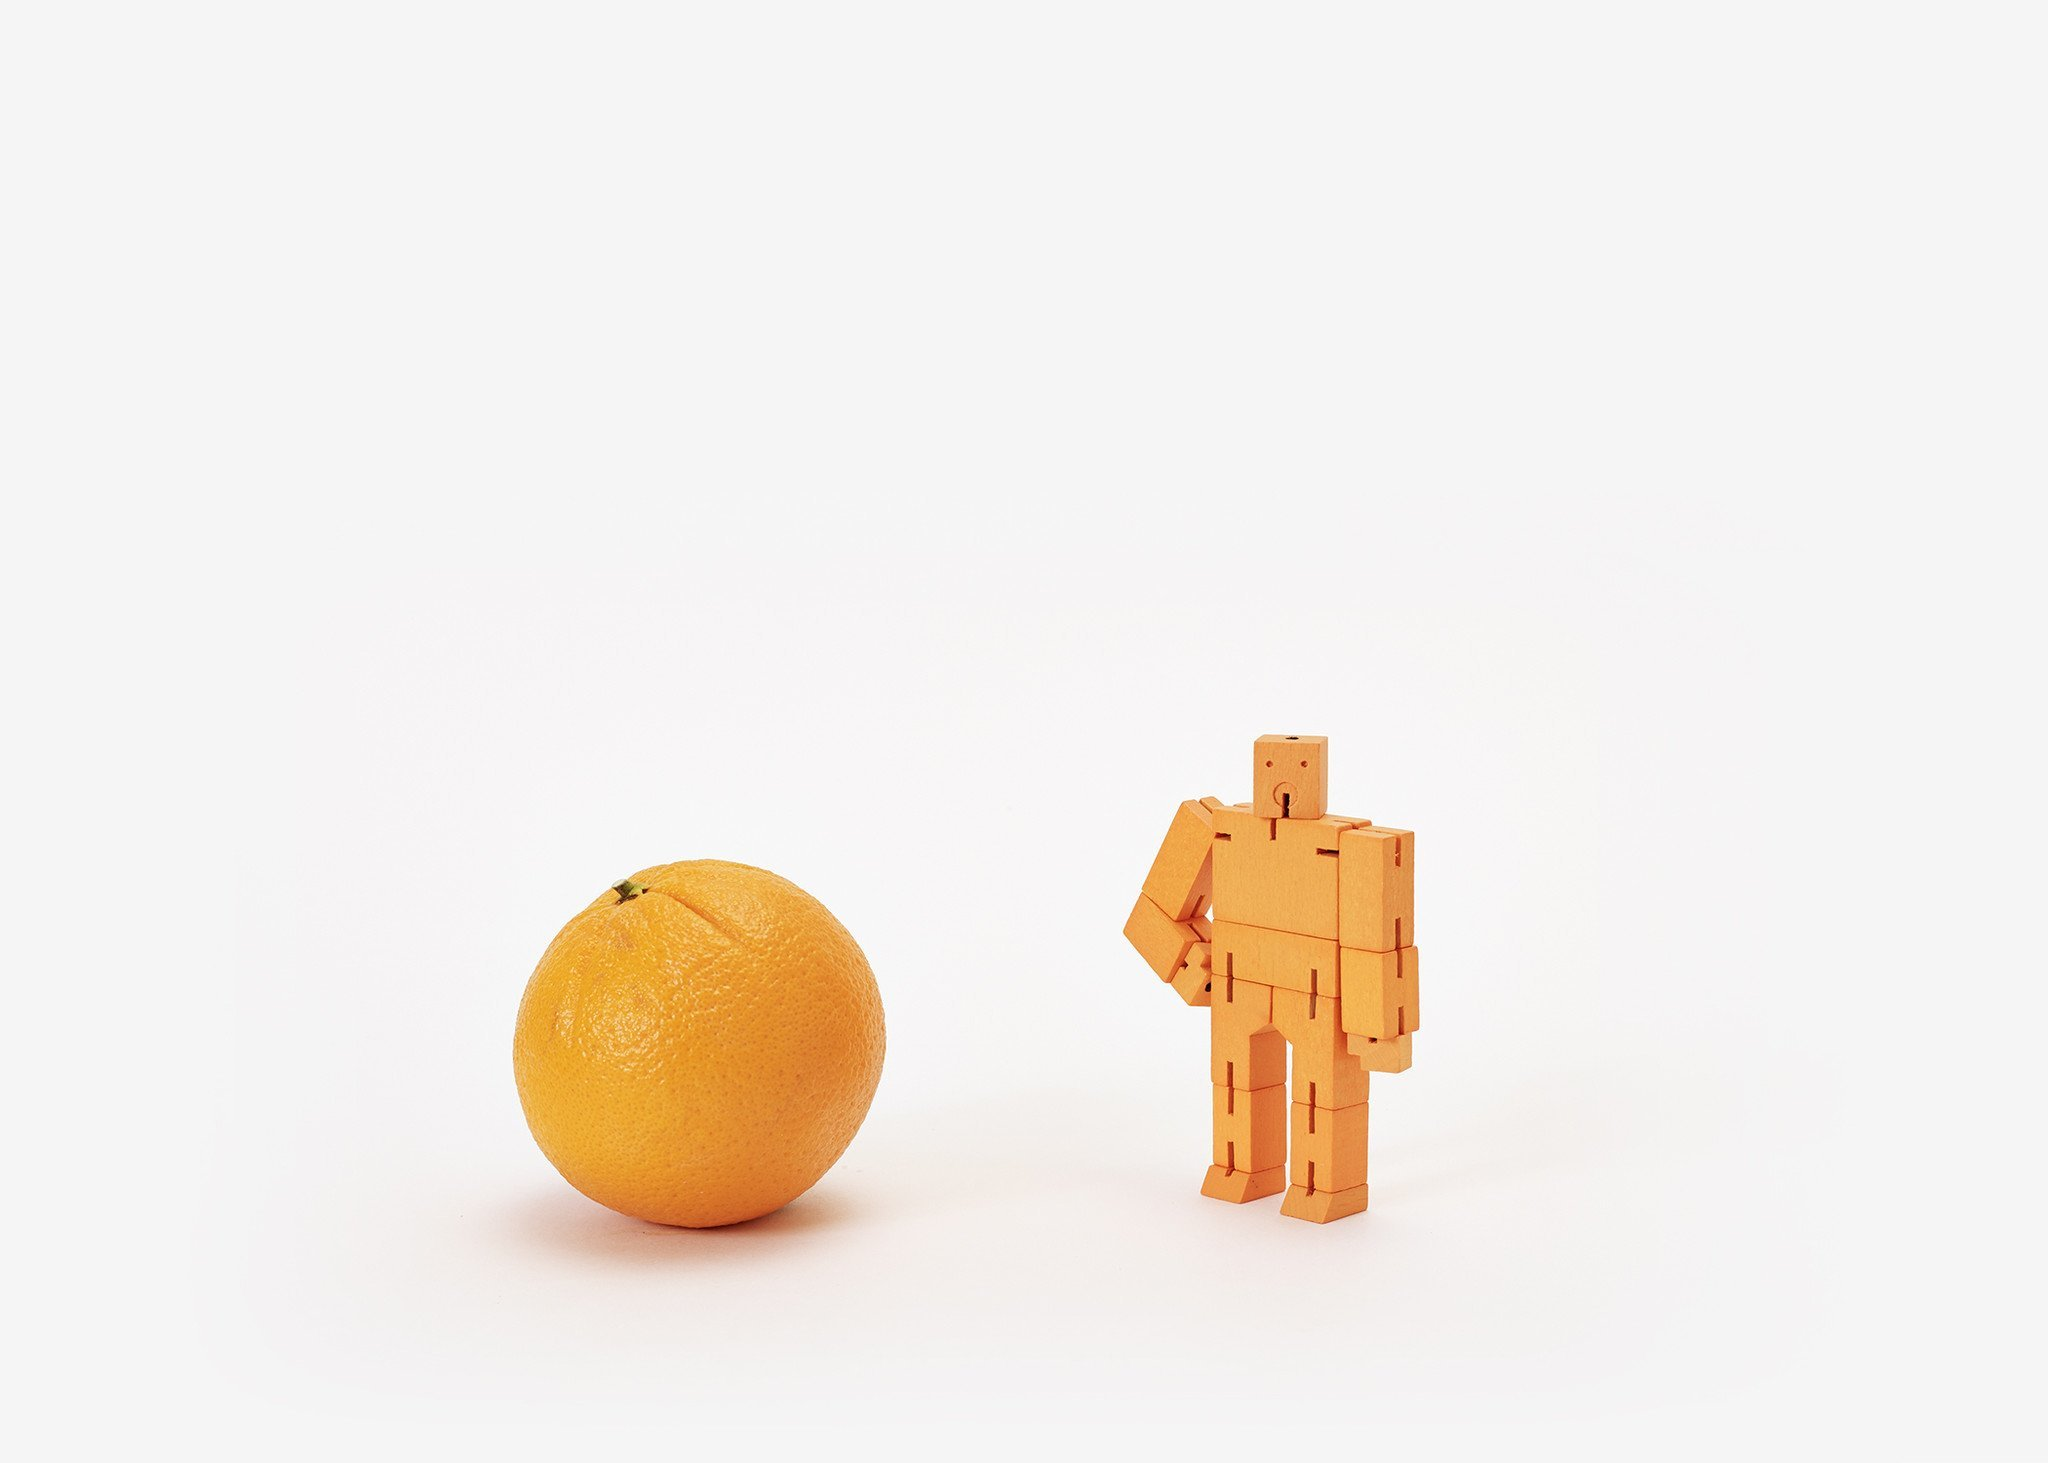 Cubebot orange micro colorstory dwc4o 823520db 04cb 4b89 948c 87e547099e16 3600x